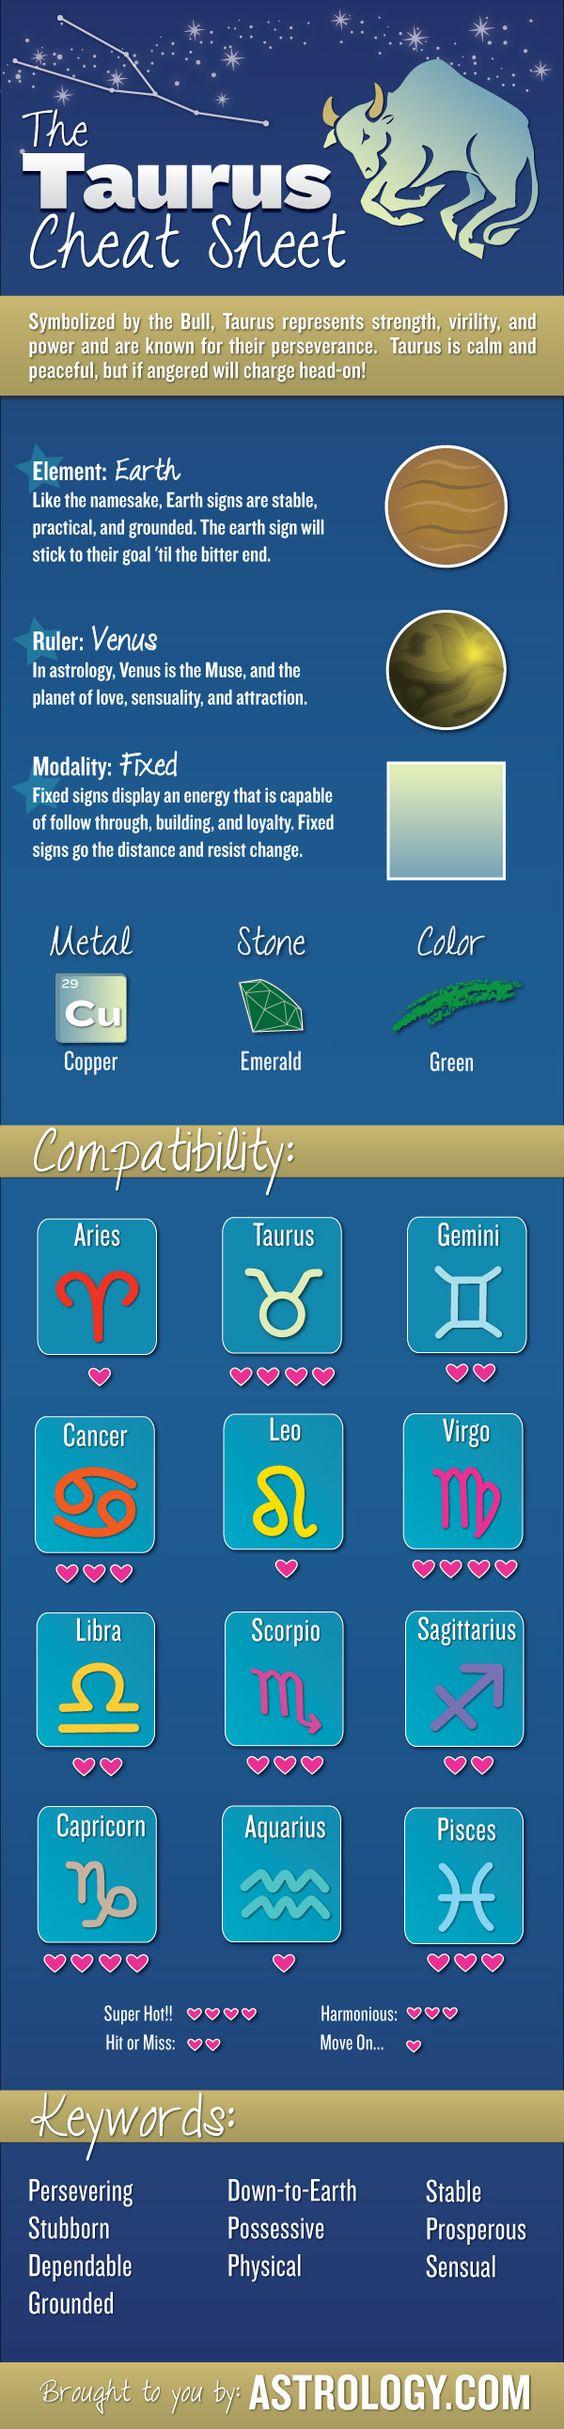 Taurus Cheat Sheet from Astrology horoscope